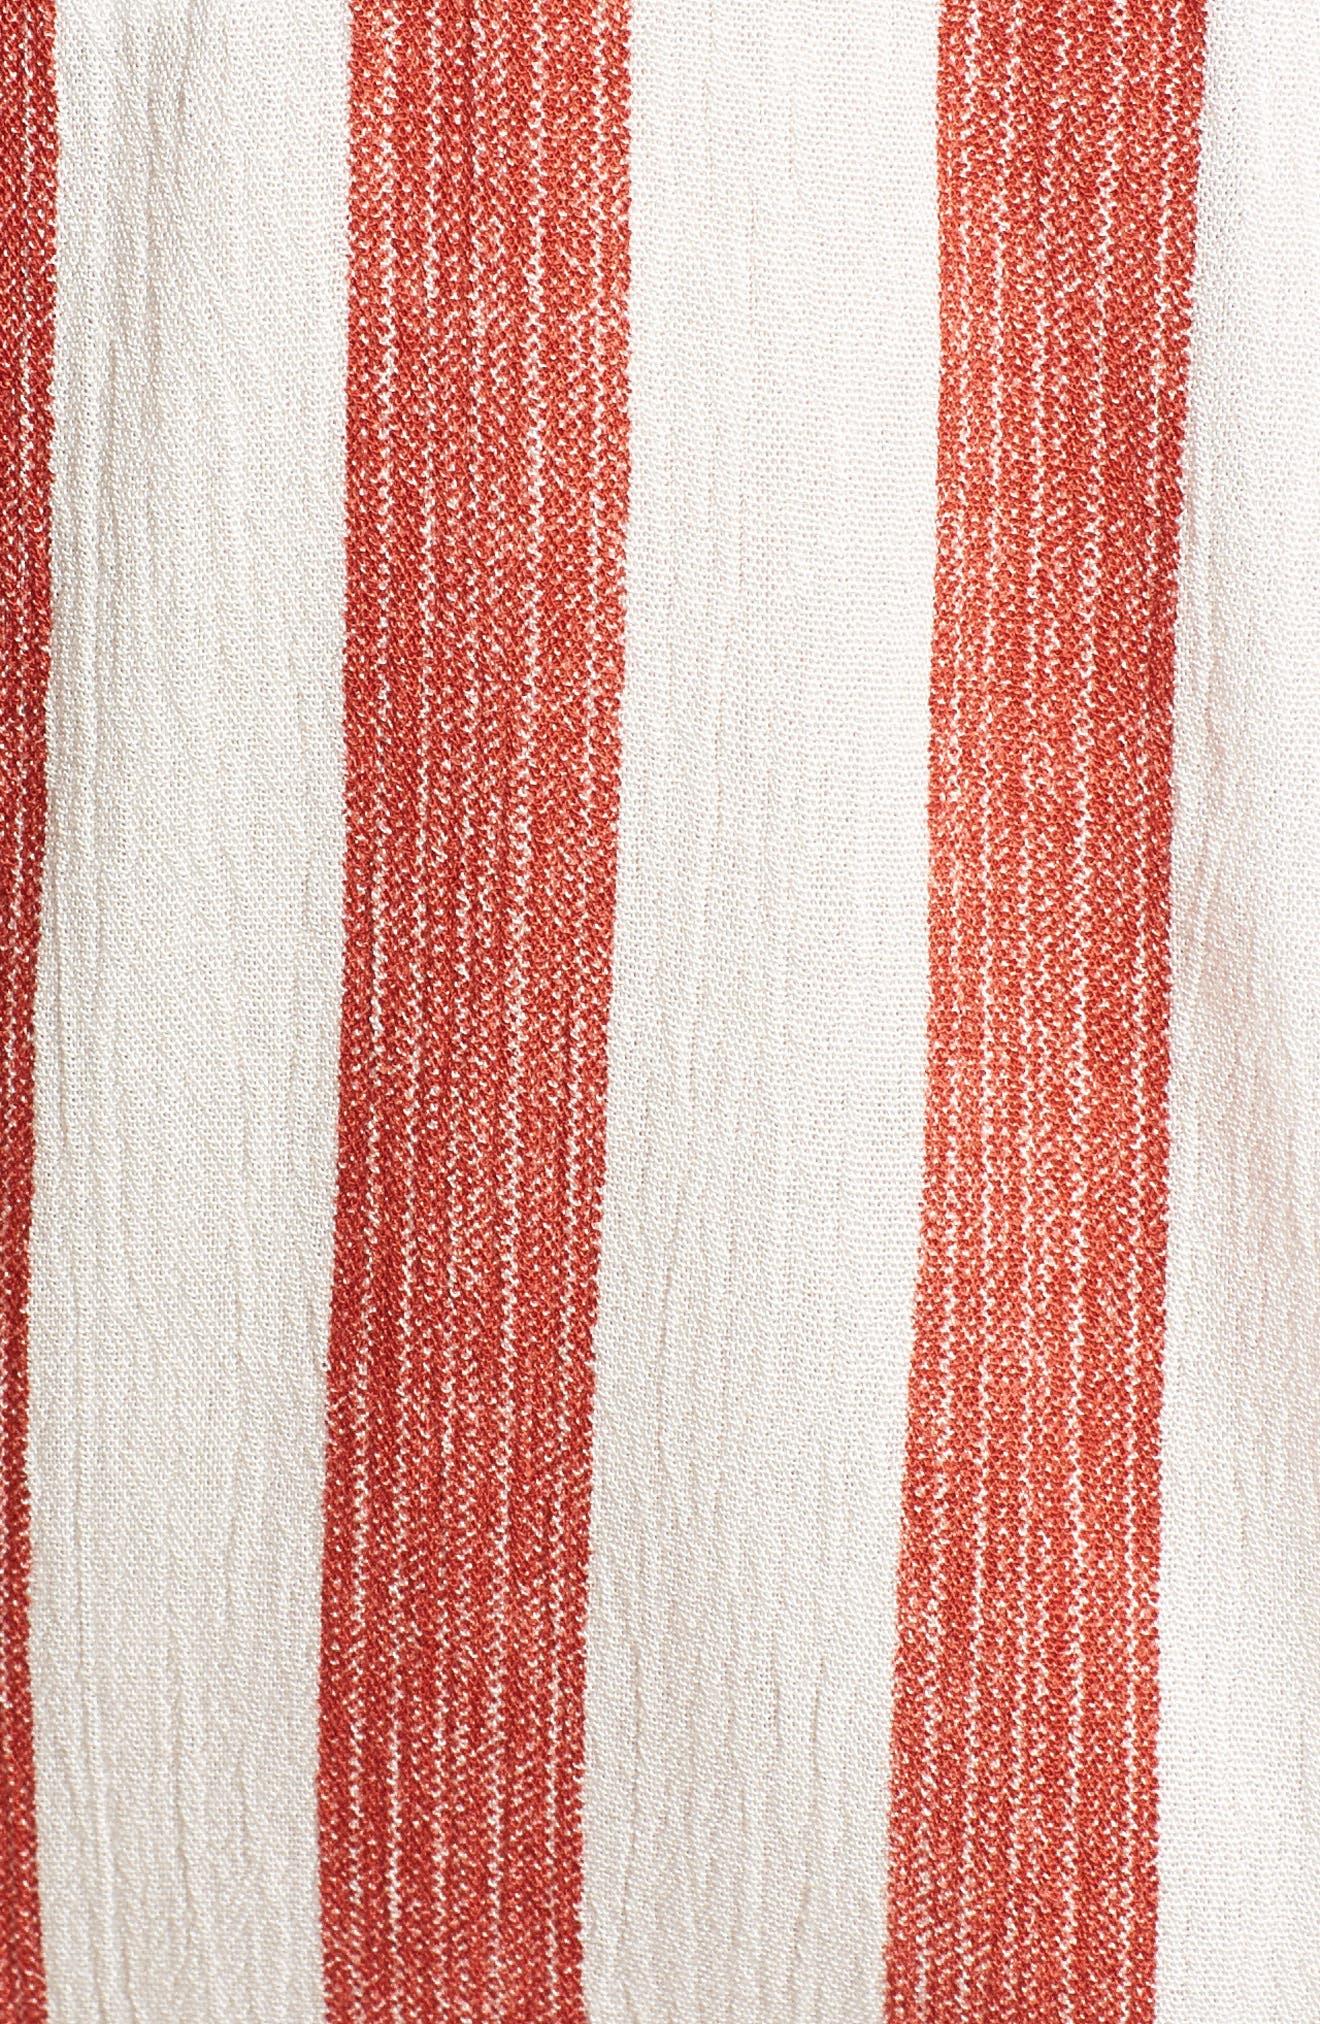 LYDELLE,                             Stripe Tie Front Top,                             Alternate thumbnail 6, color,                             600